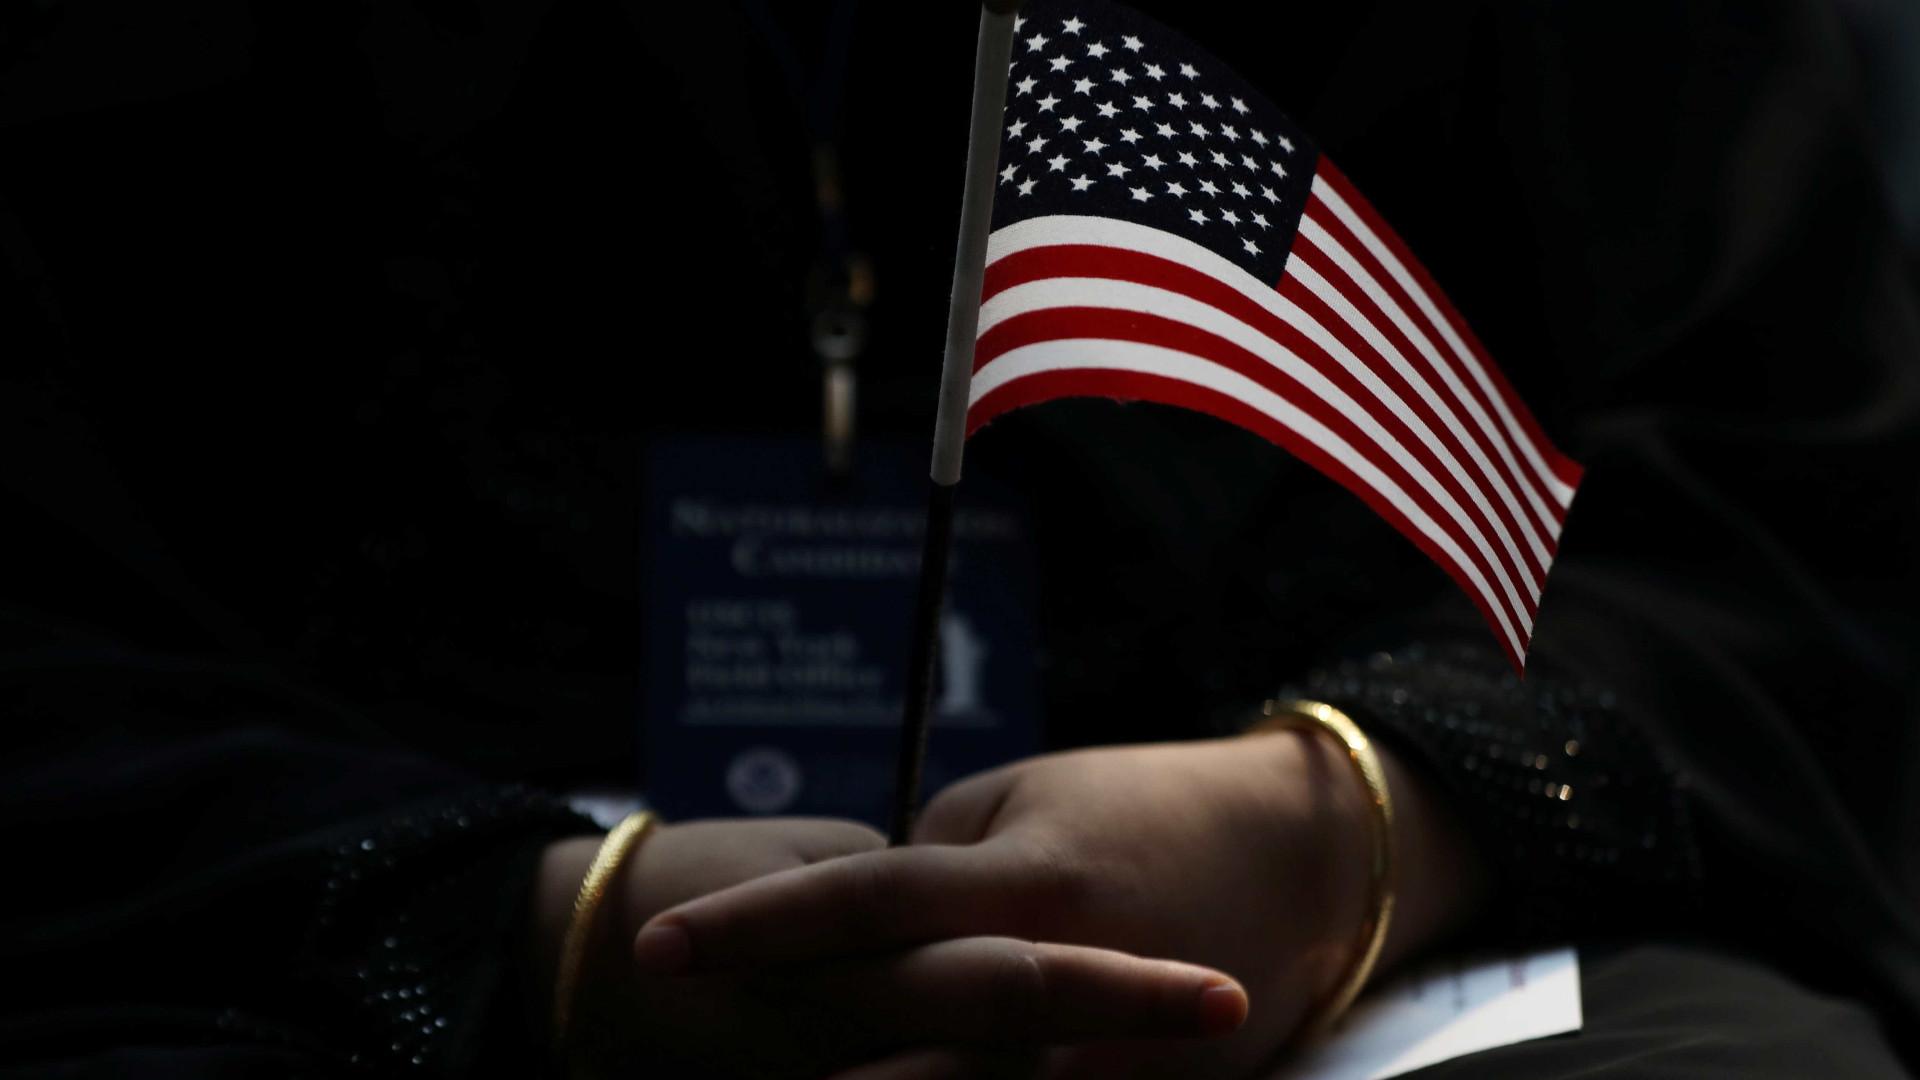 CEOs abandonam Trump após pronunciamento brando sobre Charlottesville